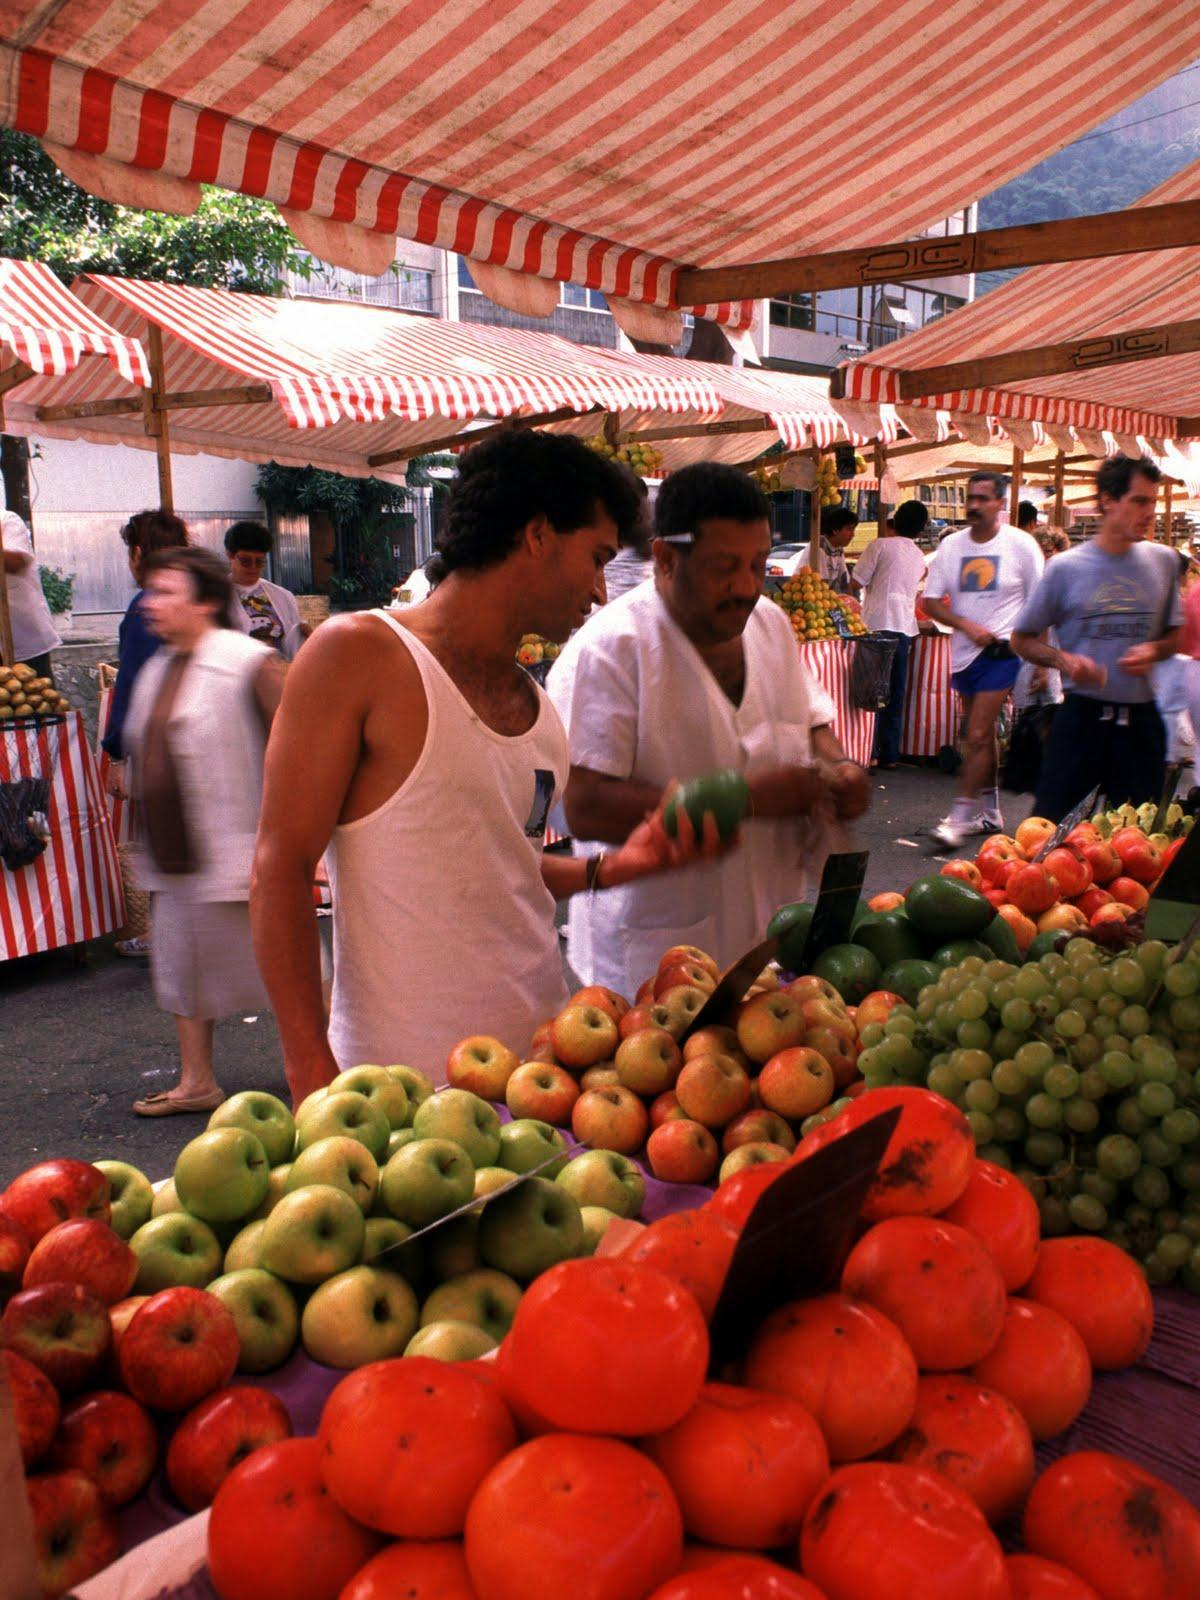 Shopping at a market in Rio